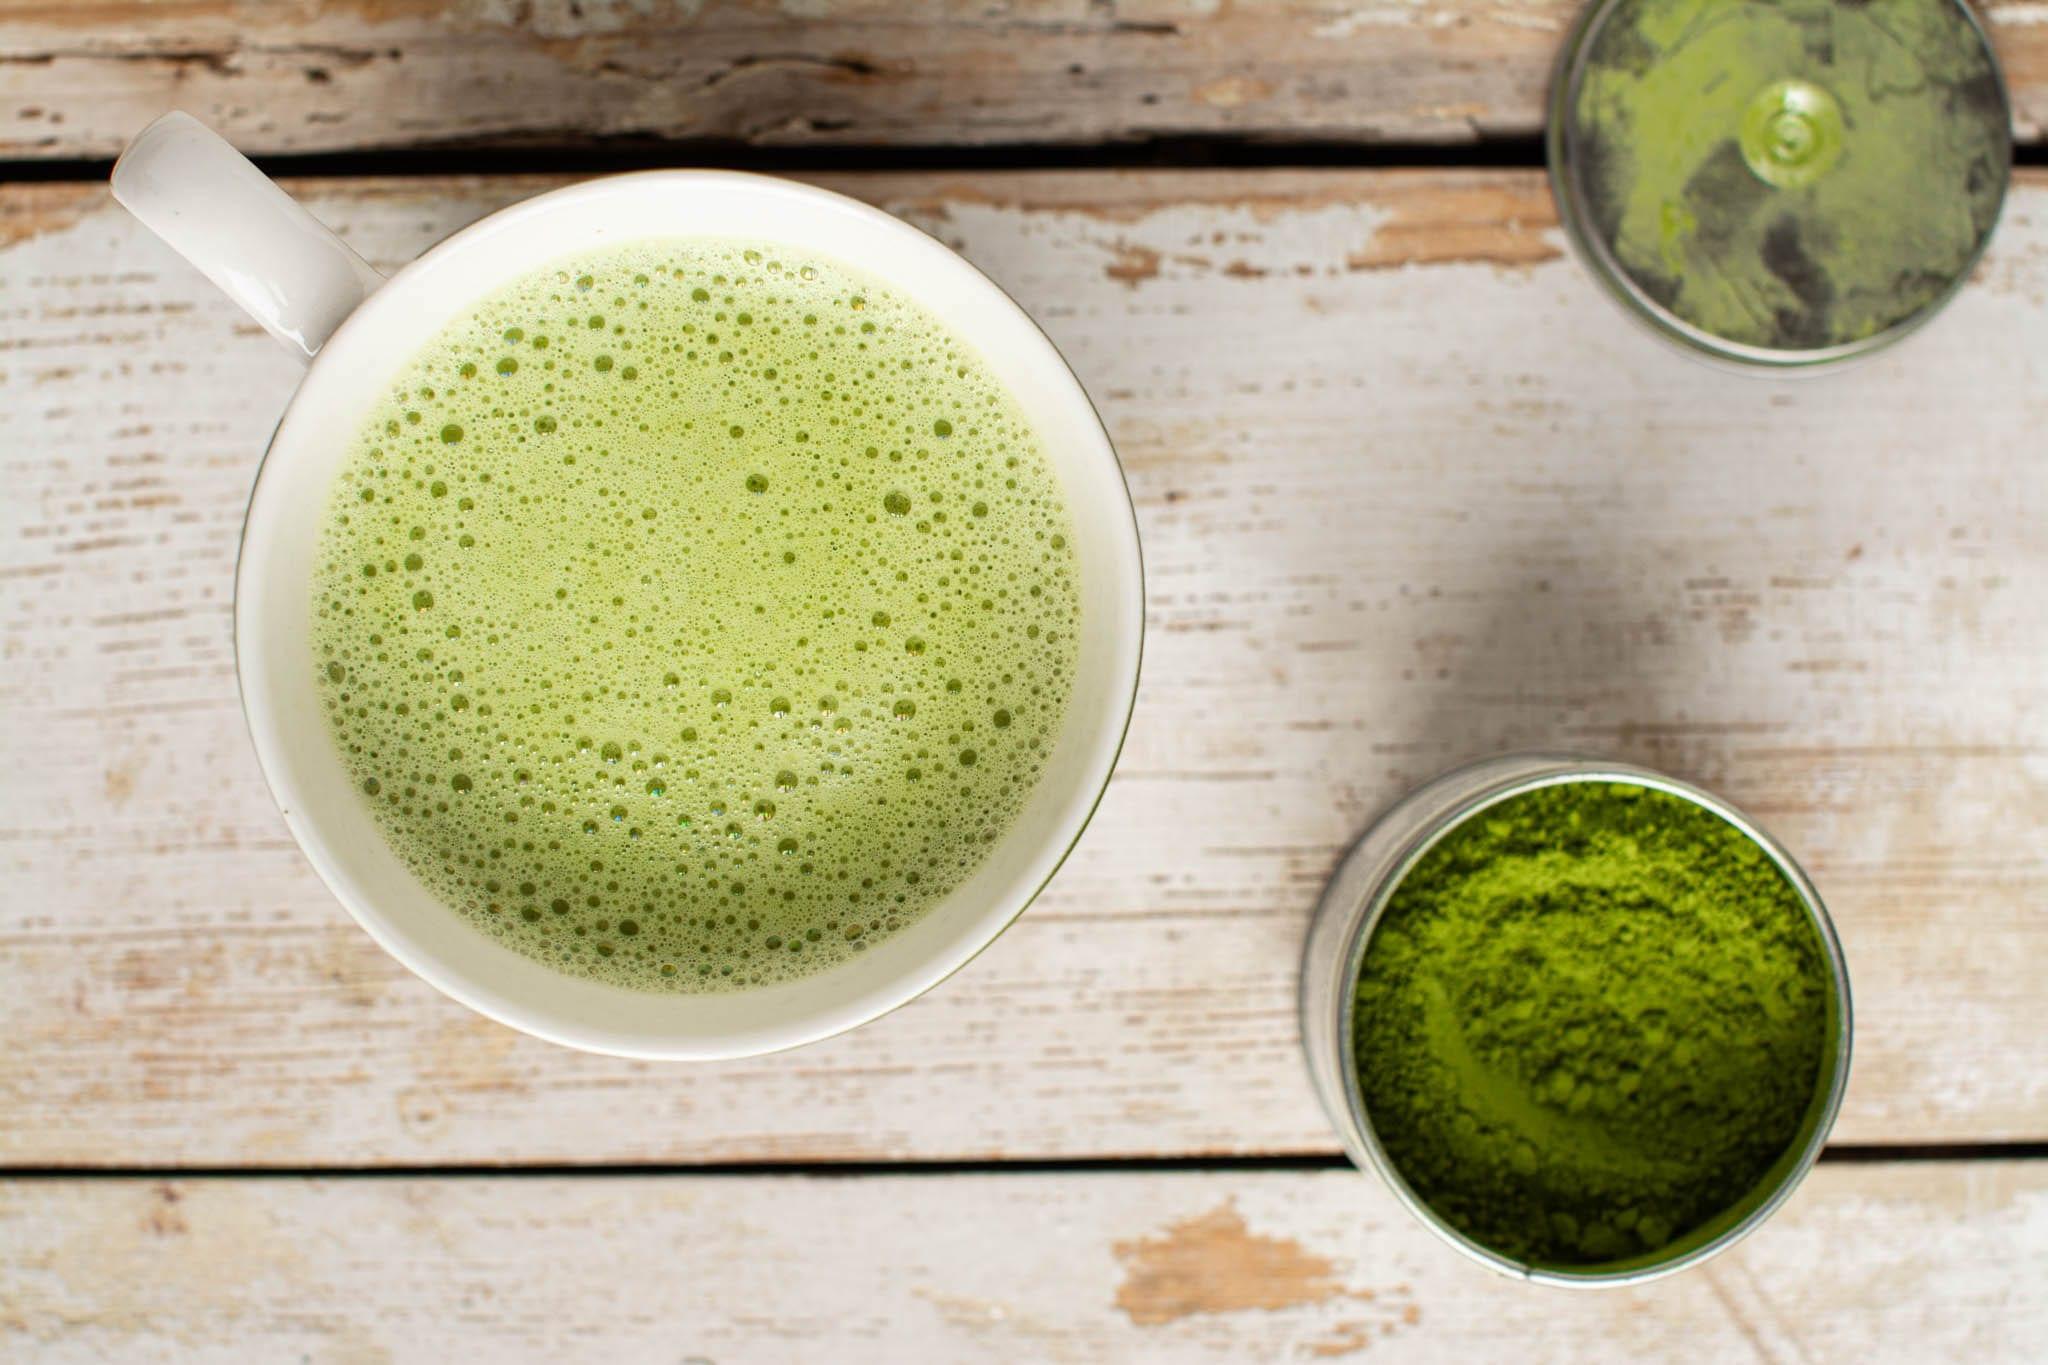 Matcha green tea latte with oat milk